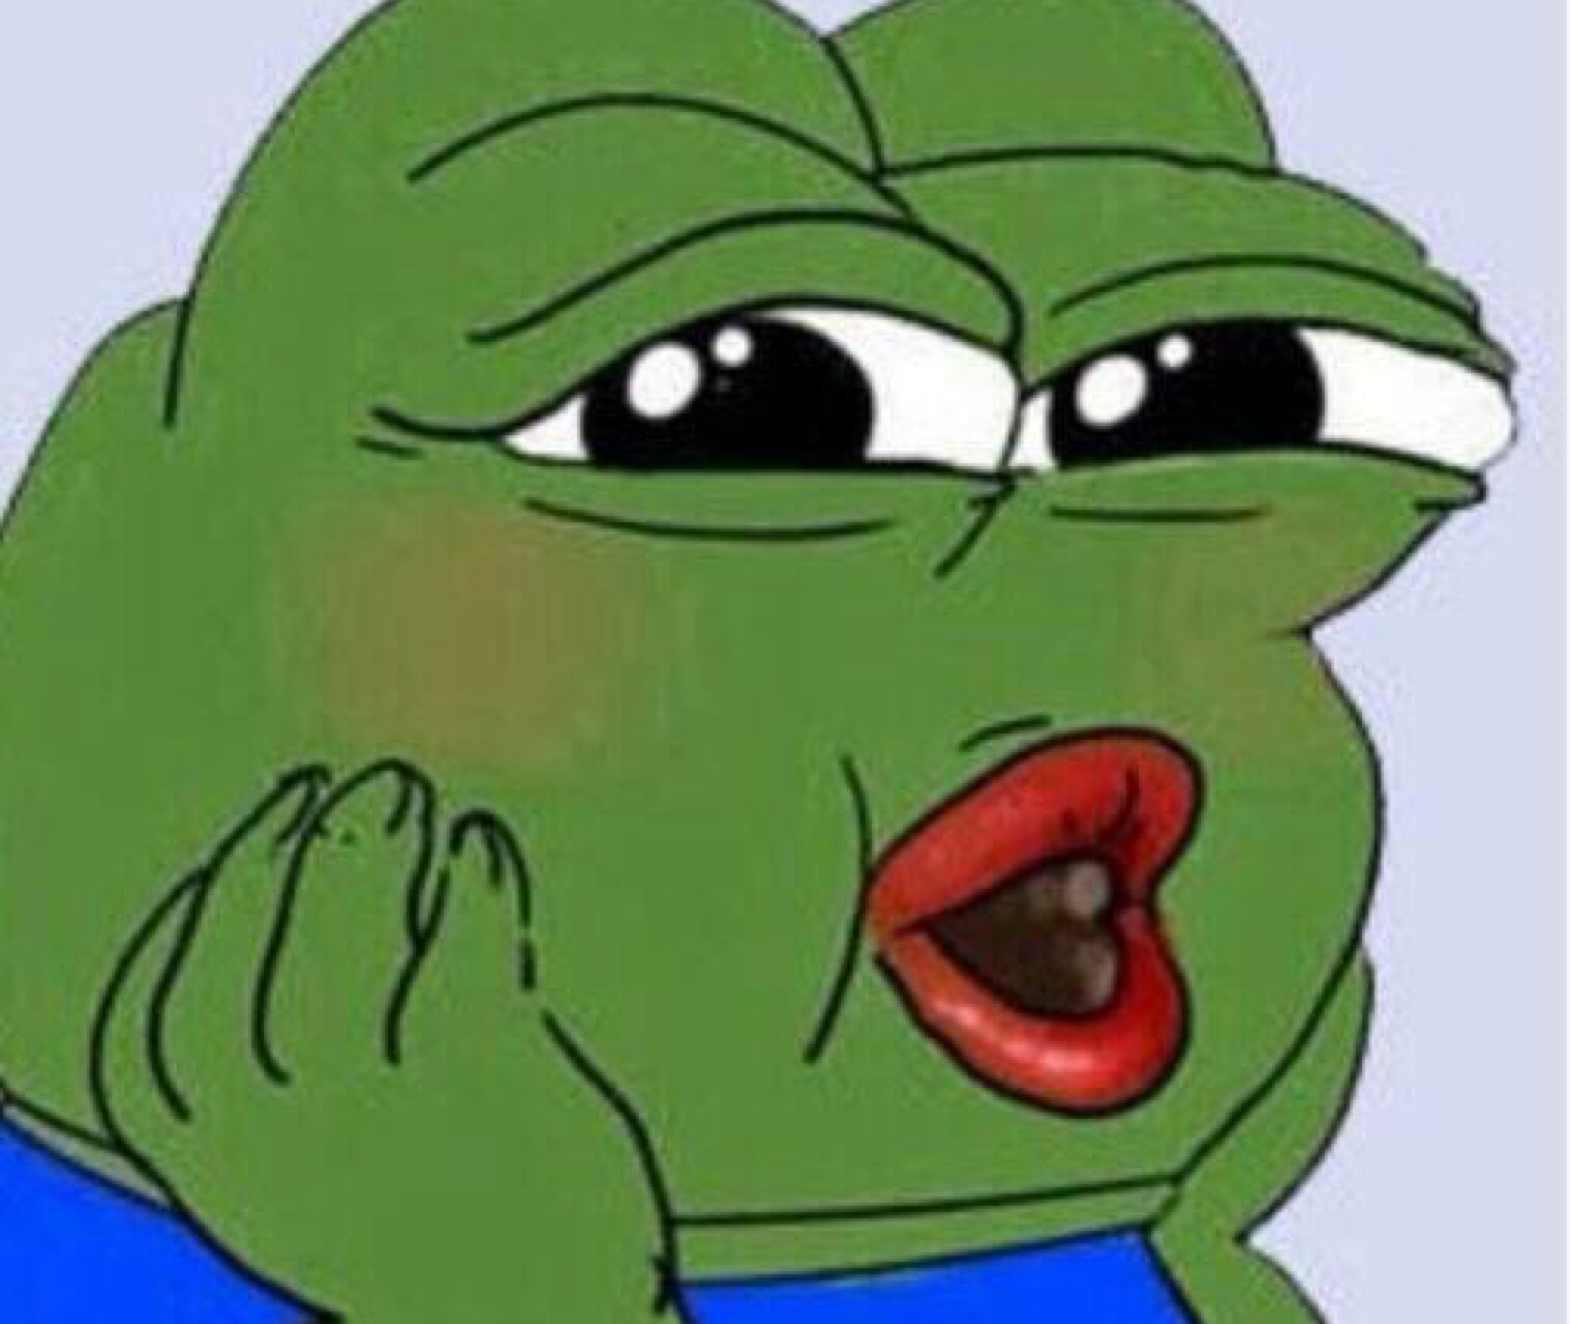 青蛙表情包_青蛙表情包_青蛙表情包图片